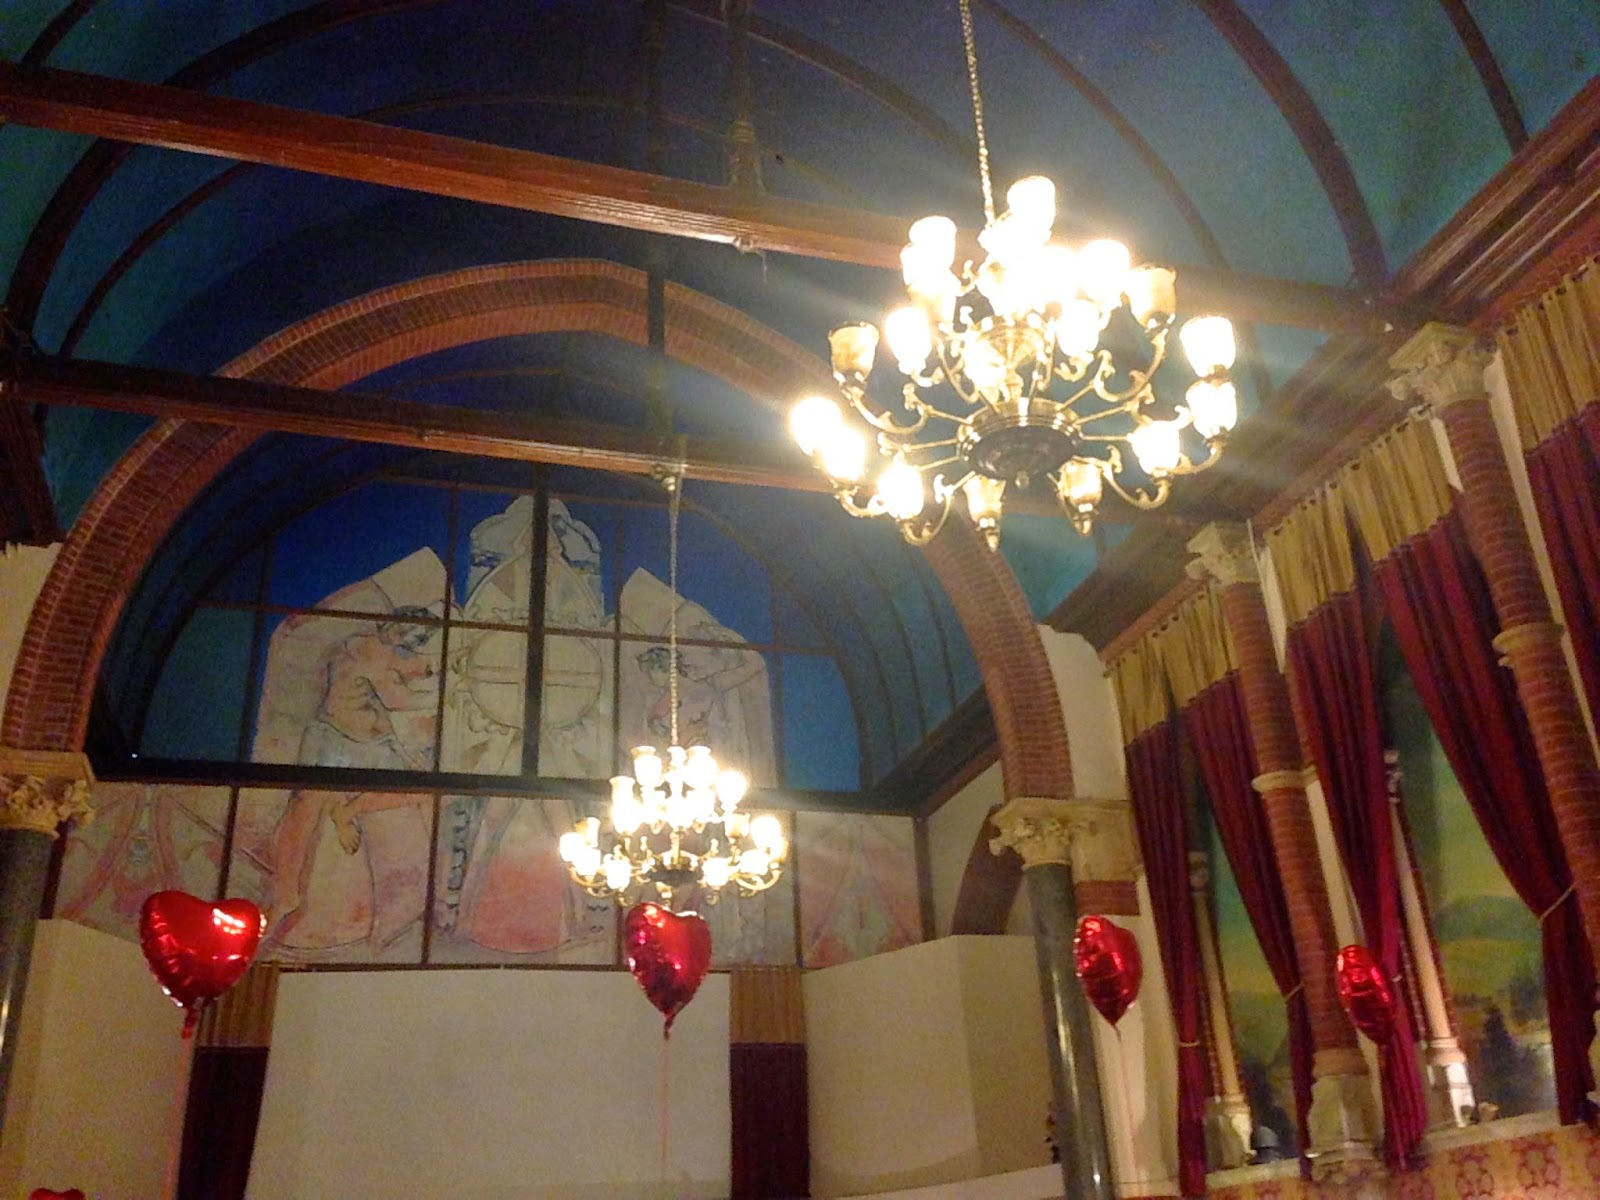 Calcutta Brasserie Stony Stratford Review